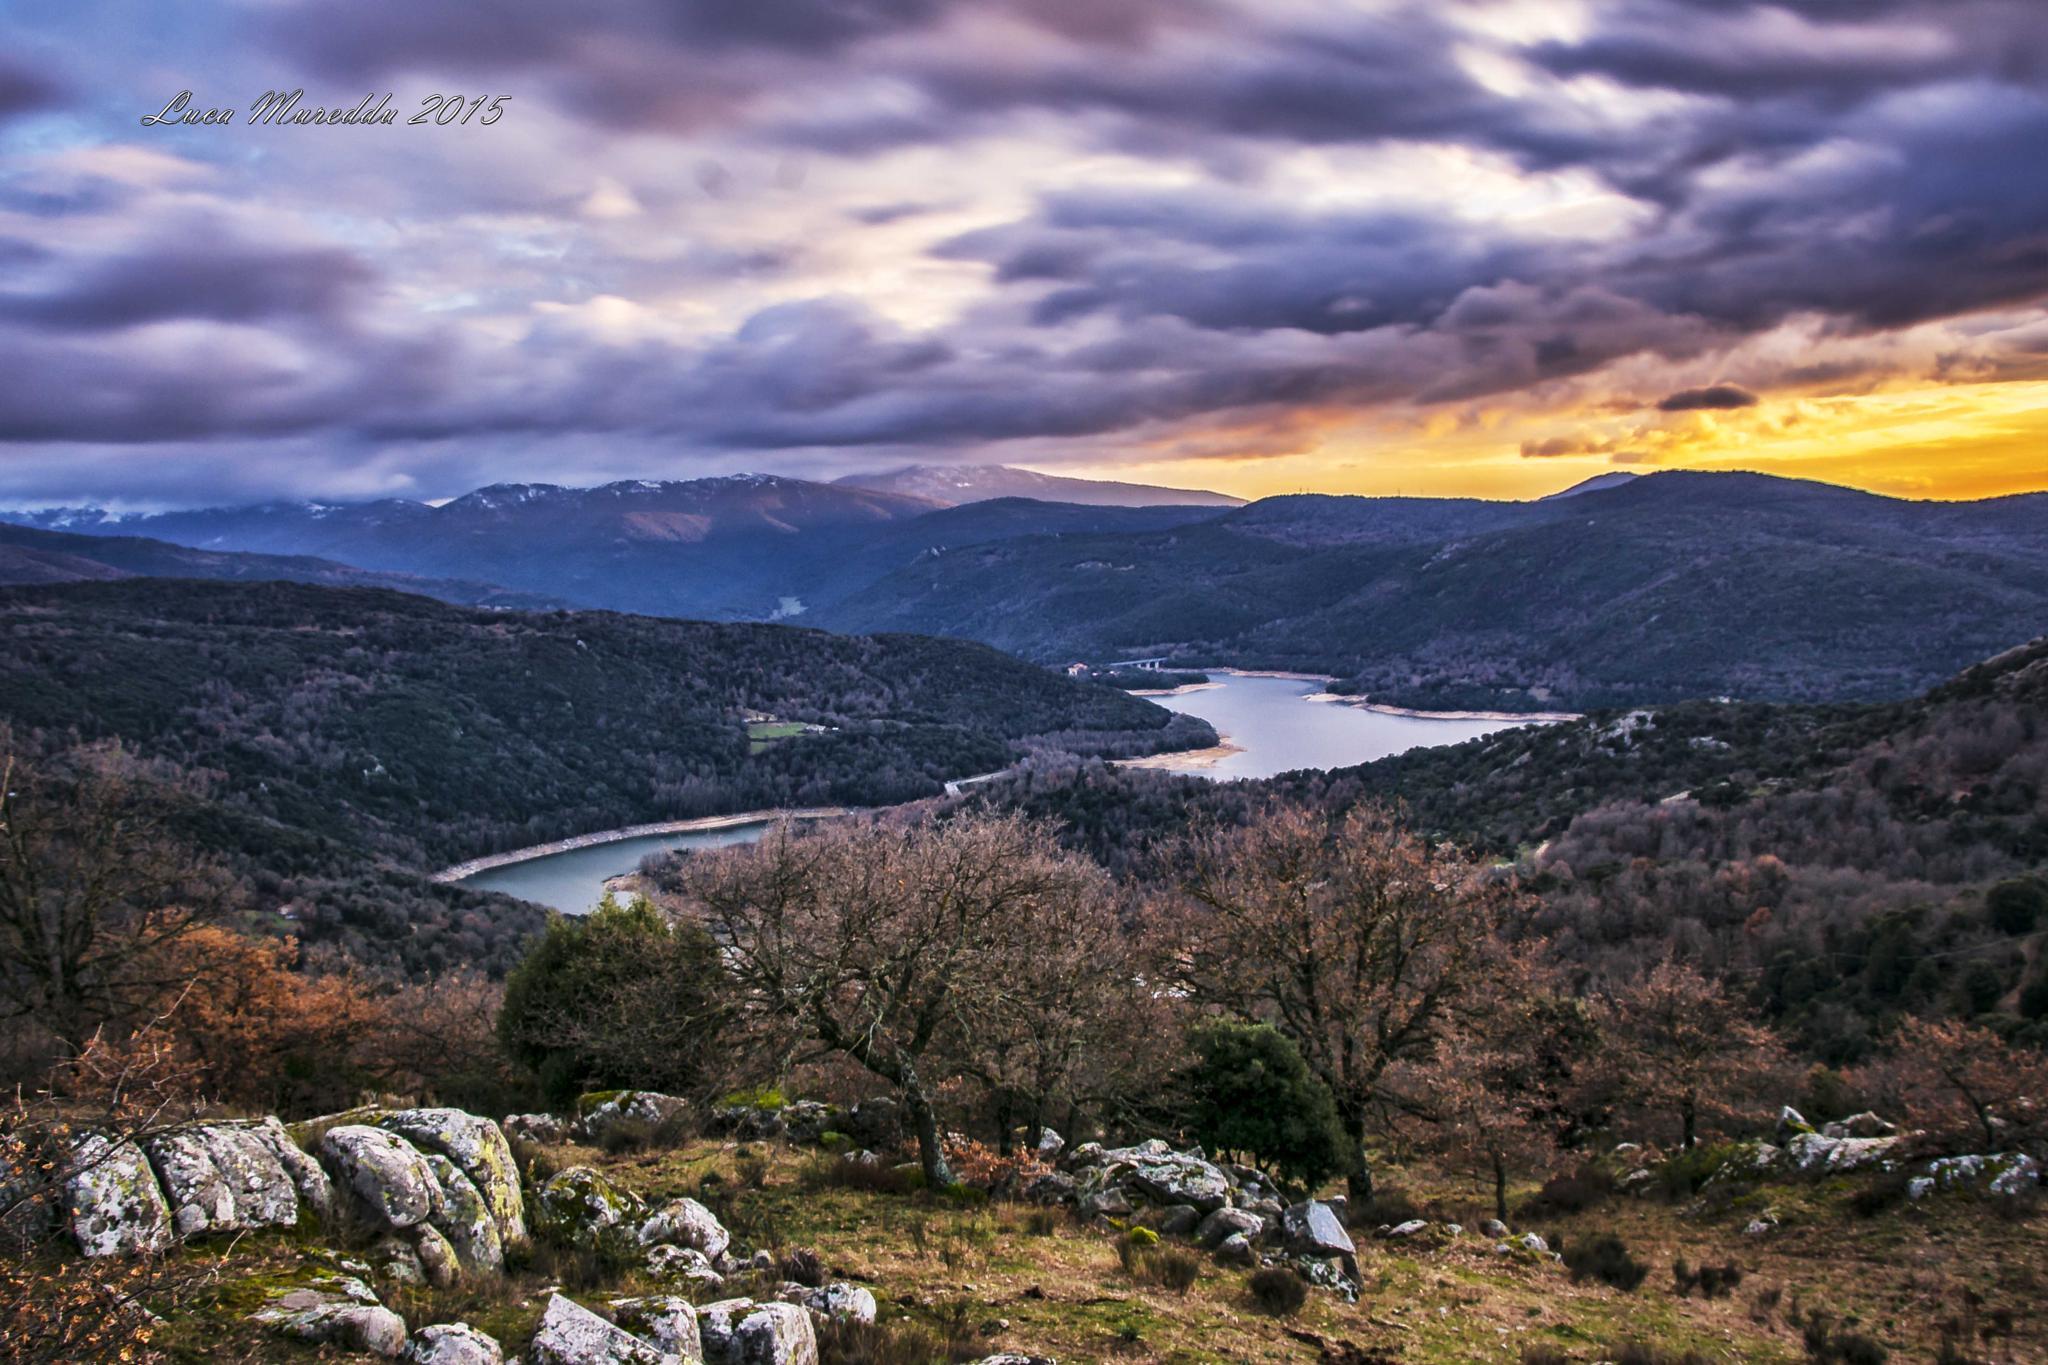 Sardigna . Lago di Gusana by dorycy